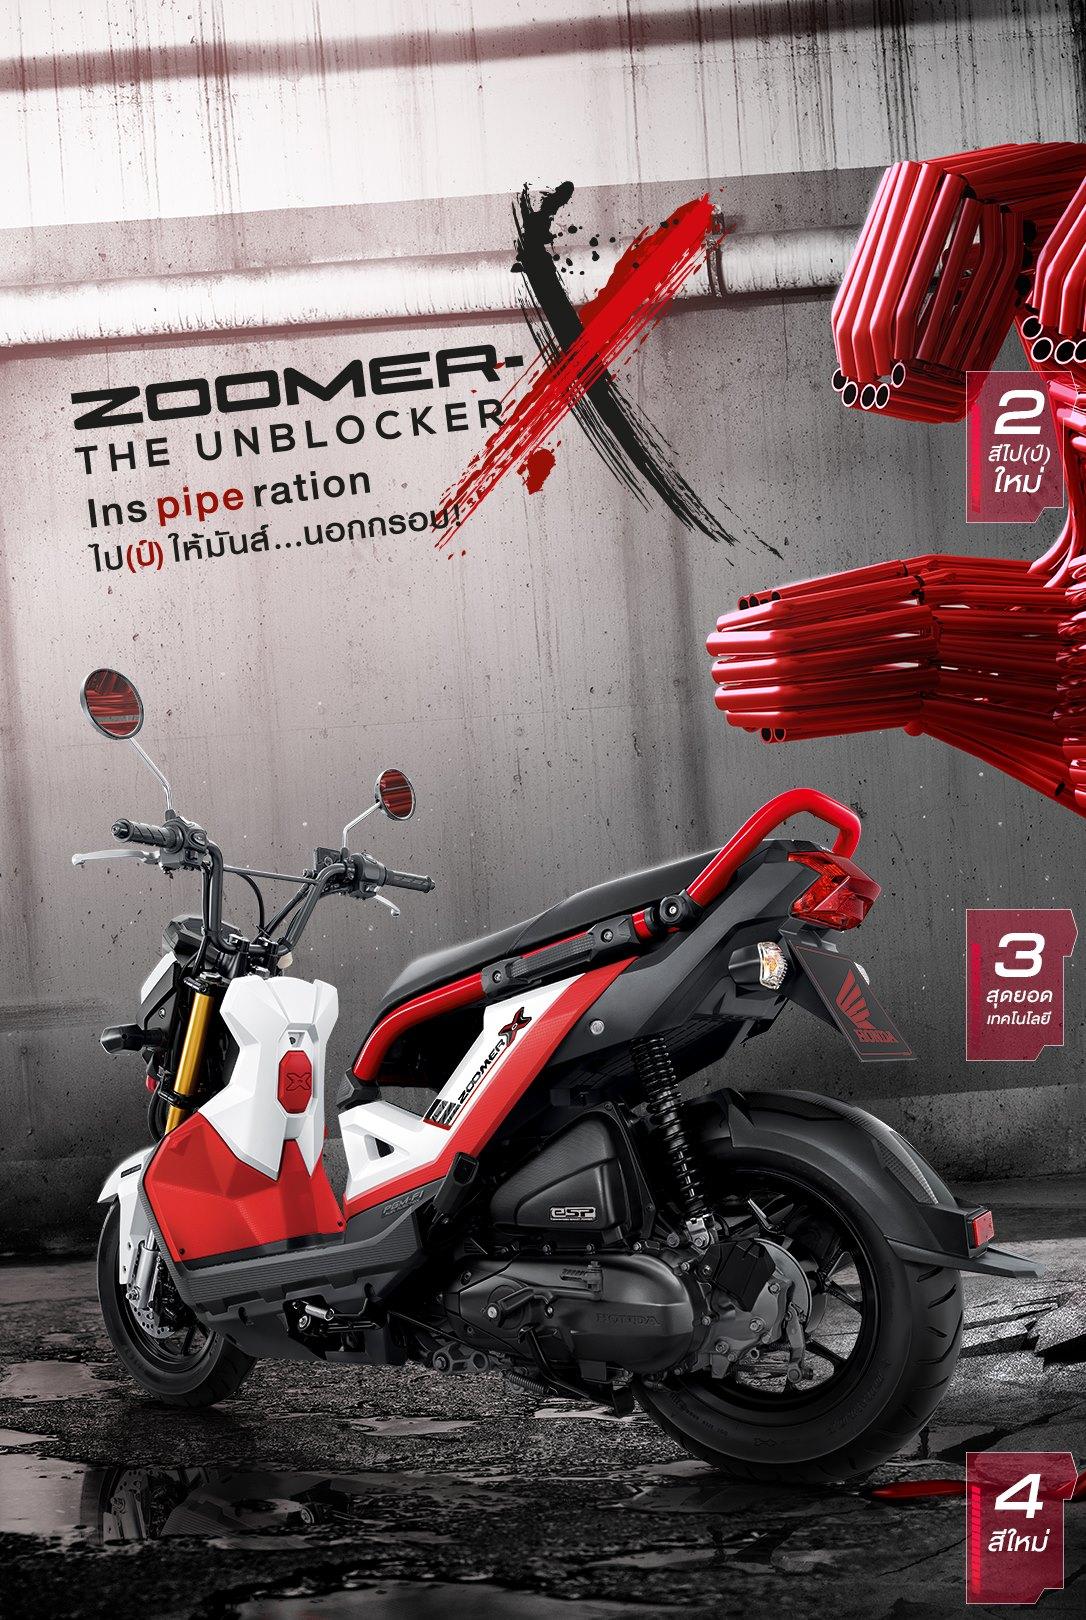 2018 honda zoomer x. fine 2018 model zoomerx thailand edition condition new with 2018 honda zoomer x